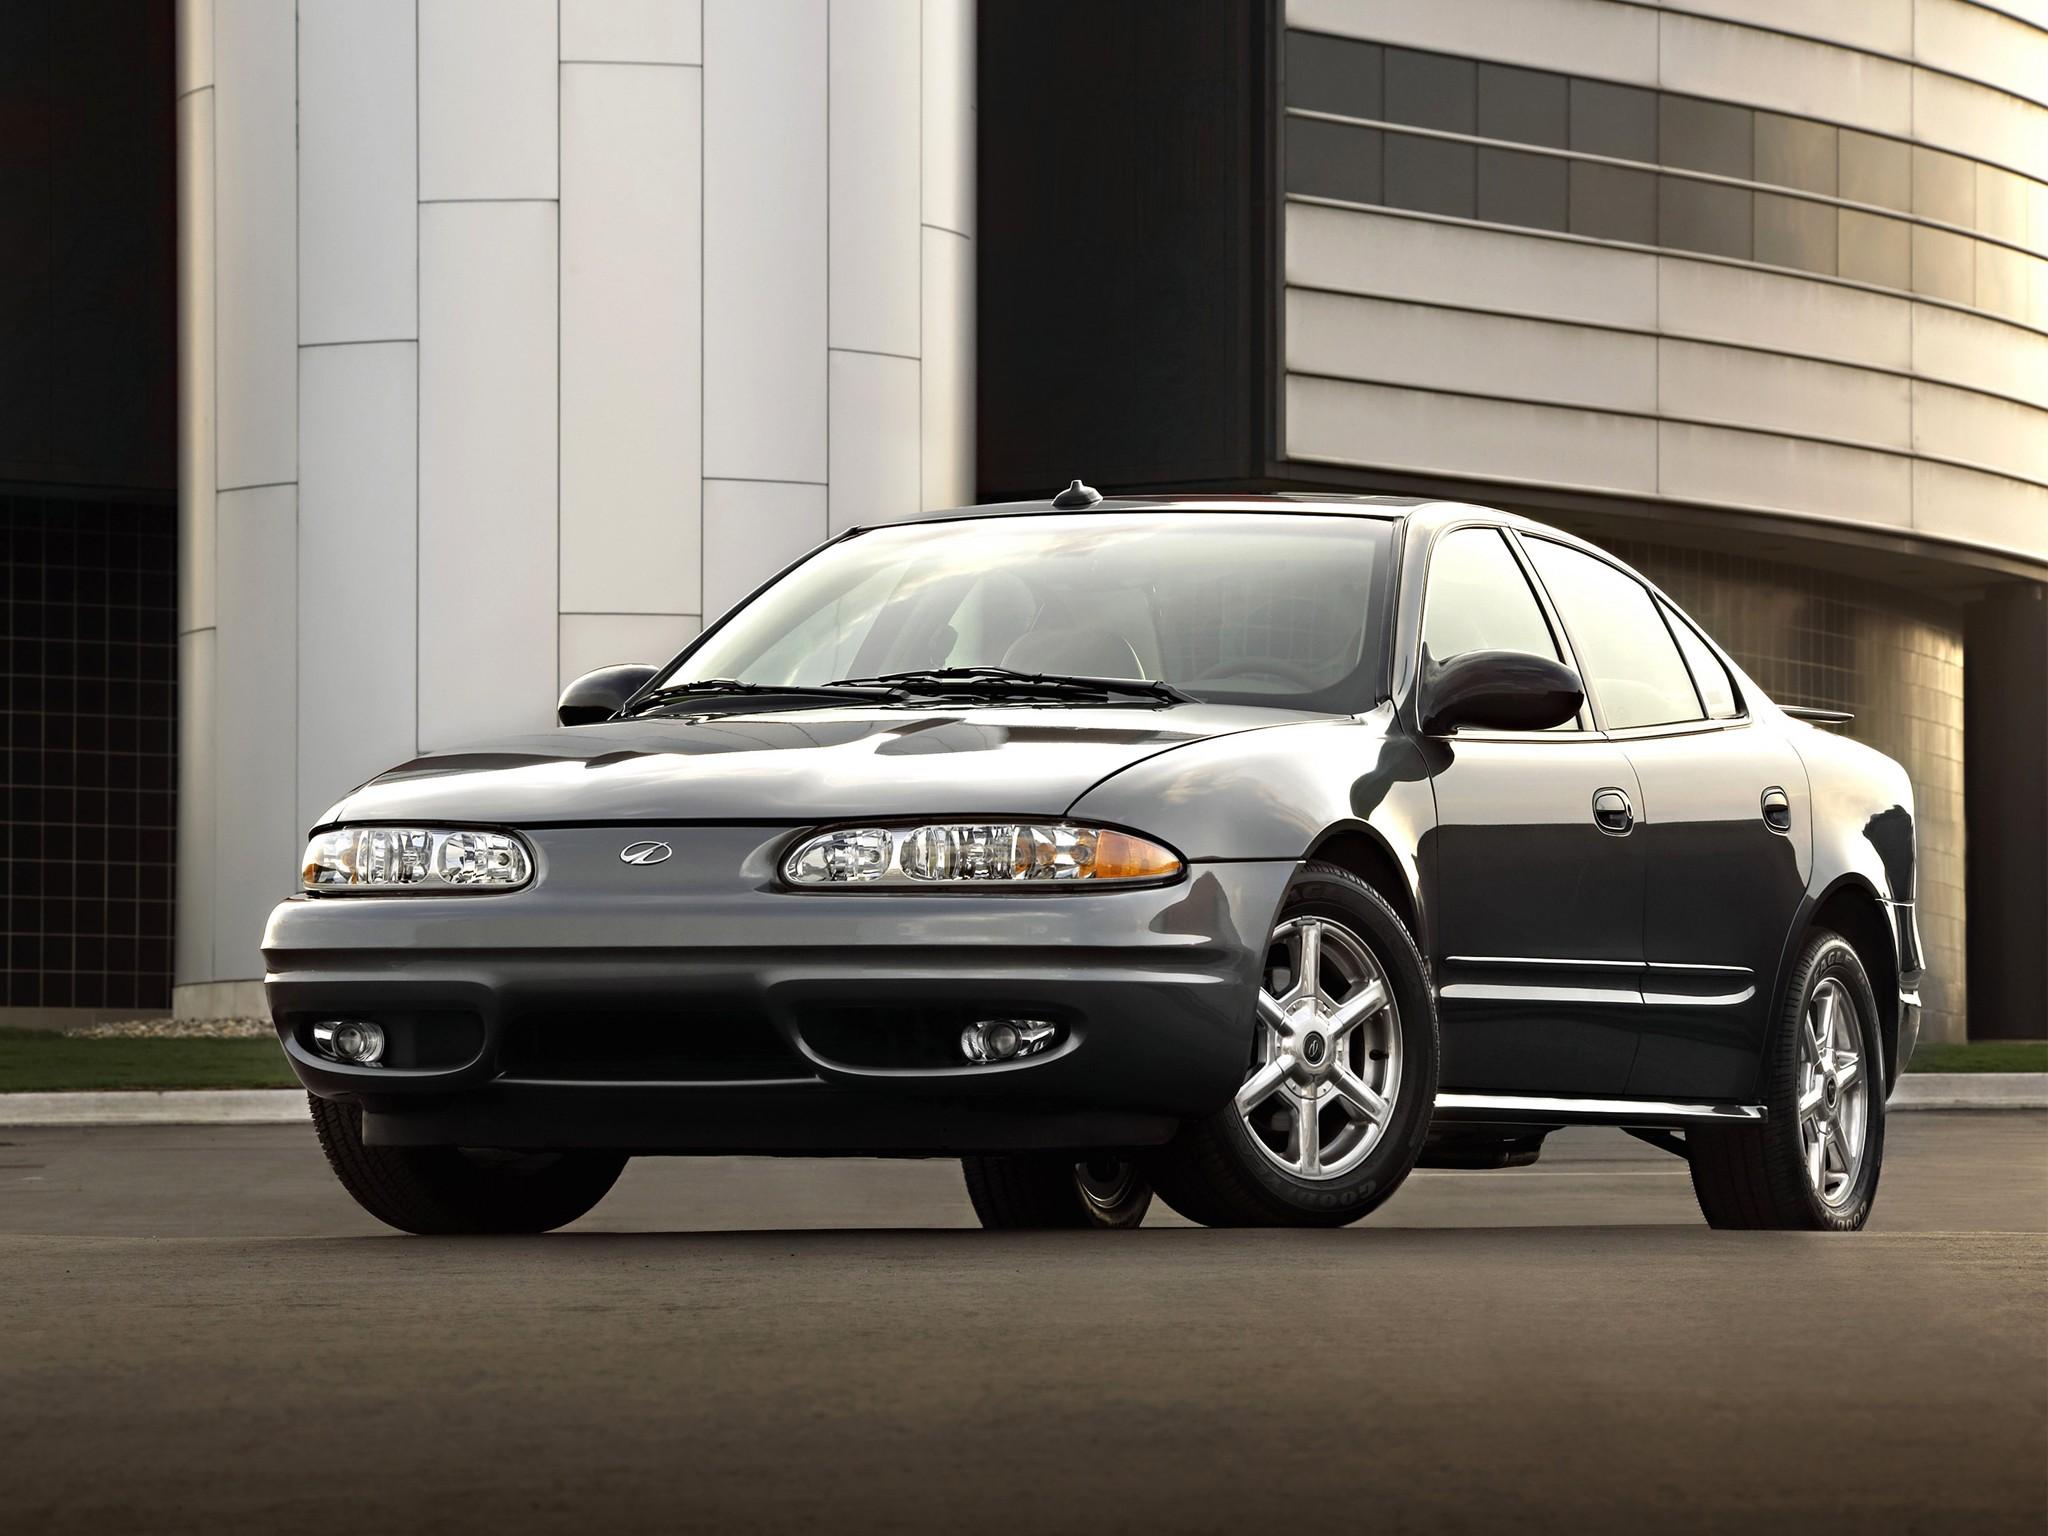 Car Tire Pressure >> OLDSMOBILE Alero sedan - 1999, 2000, 2001, 2002, 2003, 2004 - autoevolution